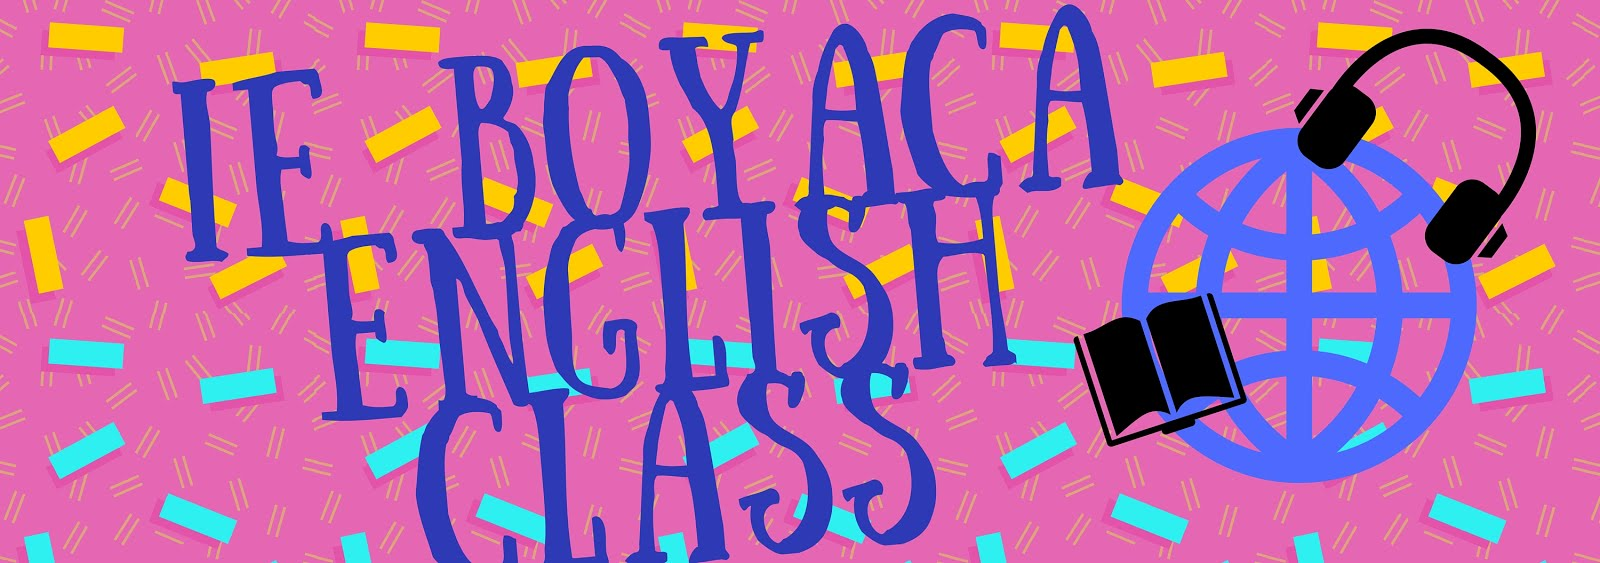 INGLES BOYACA